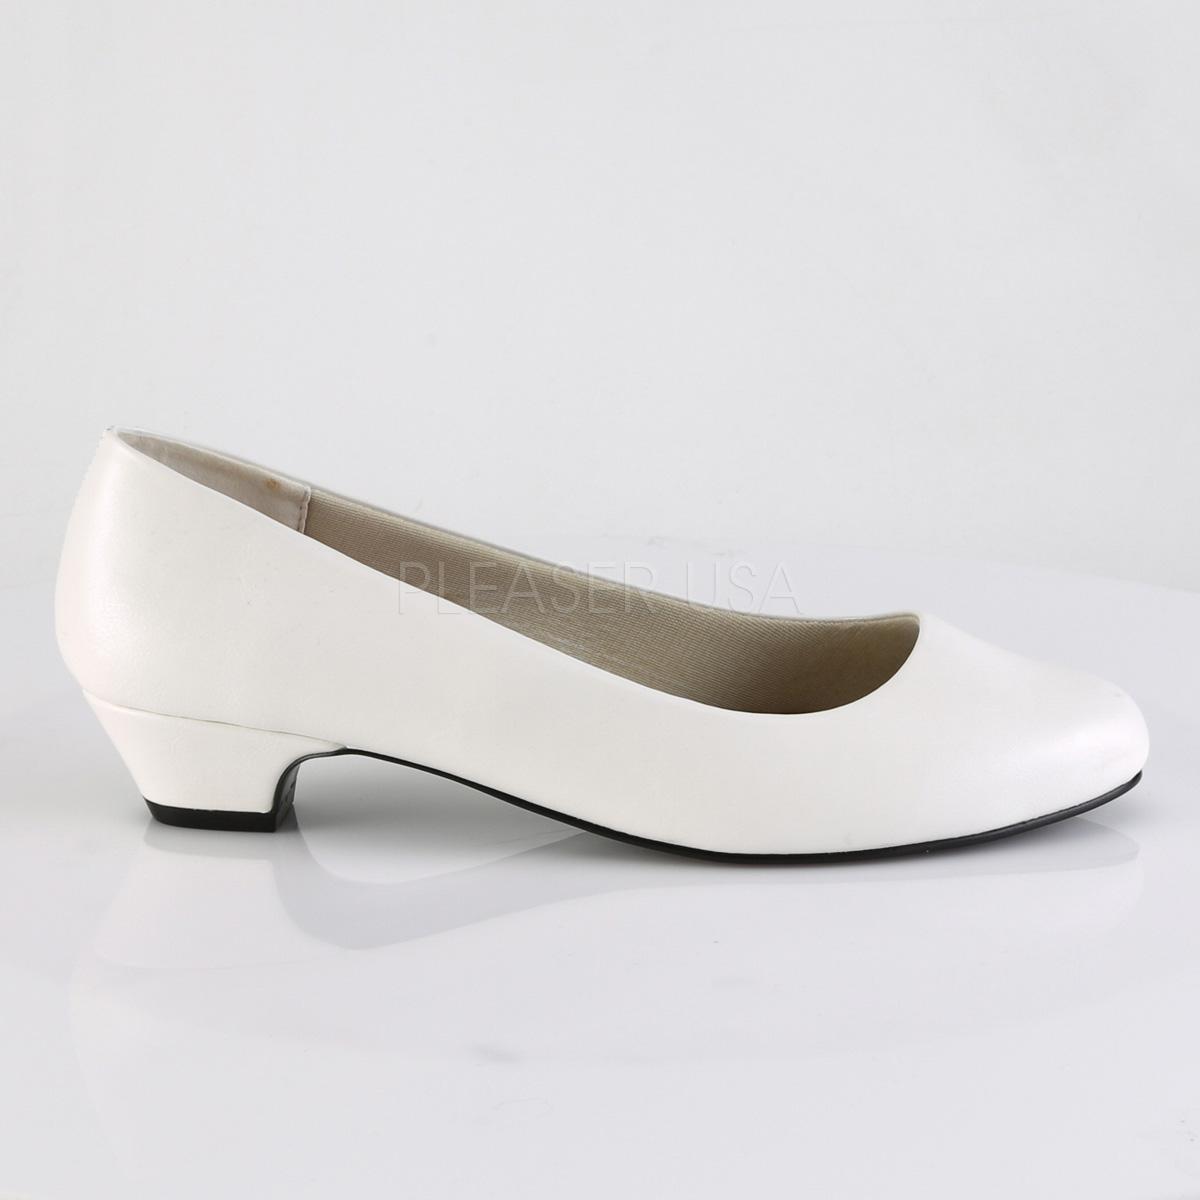 sale retailer 7c631 7f5db Vegano 3 cm GWEN-01 scarpe décolleté da uomo bianco